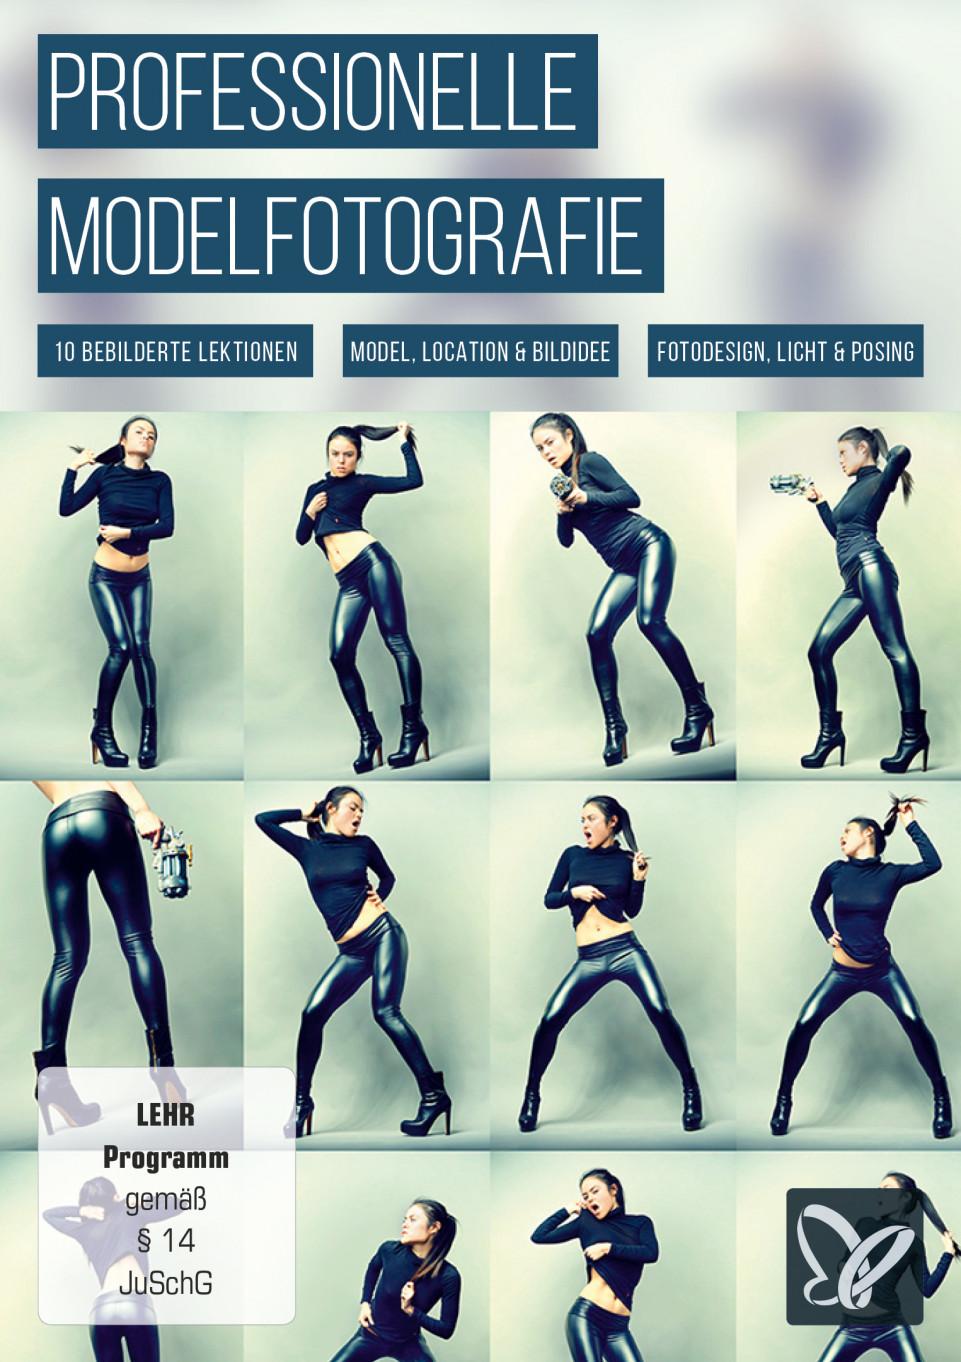 Professionelle Modelfotografie